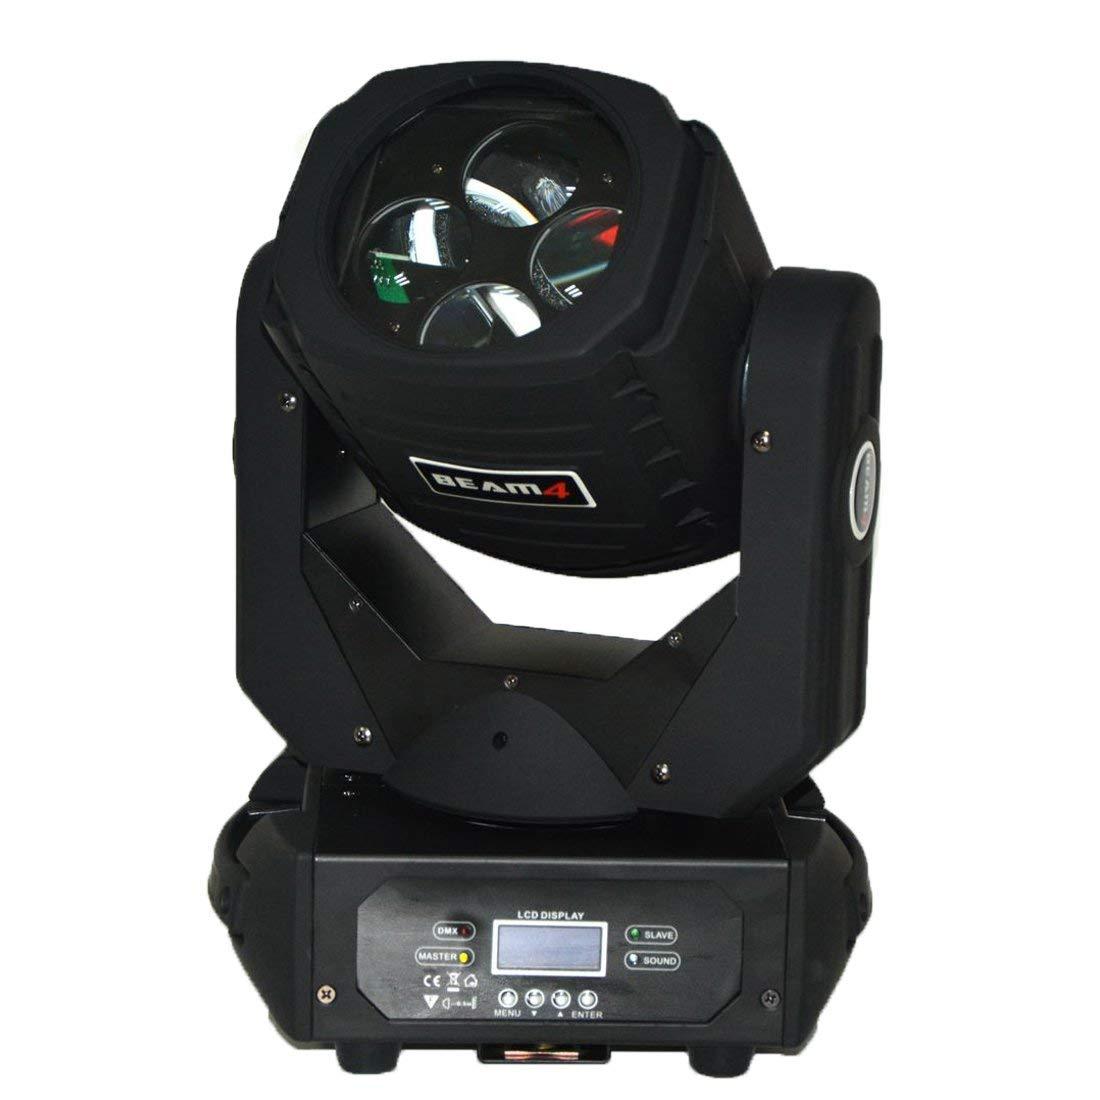 MOKA SFX 2pcs 4x25W LED 140W Super Beam Moving Head Lights Spot Zoom DMX 9/15CH for Disco Stage Wedding Party Decorations